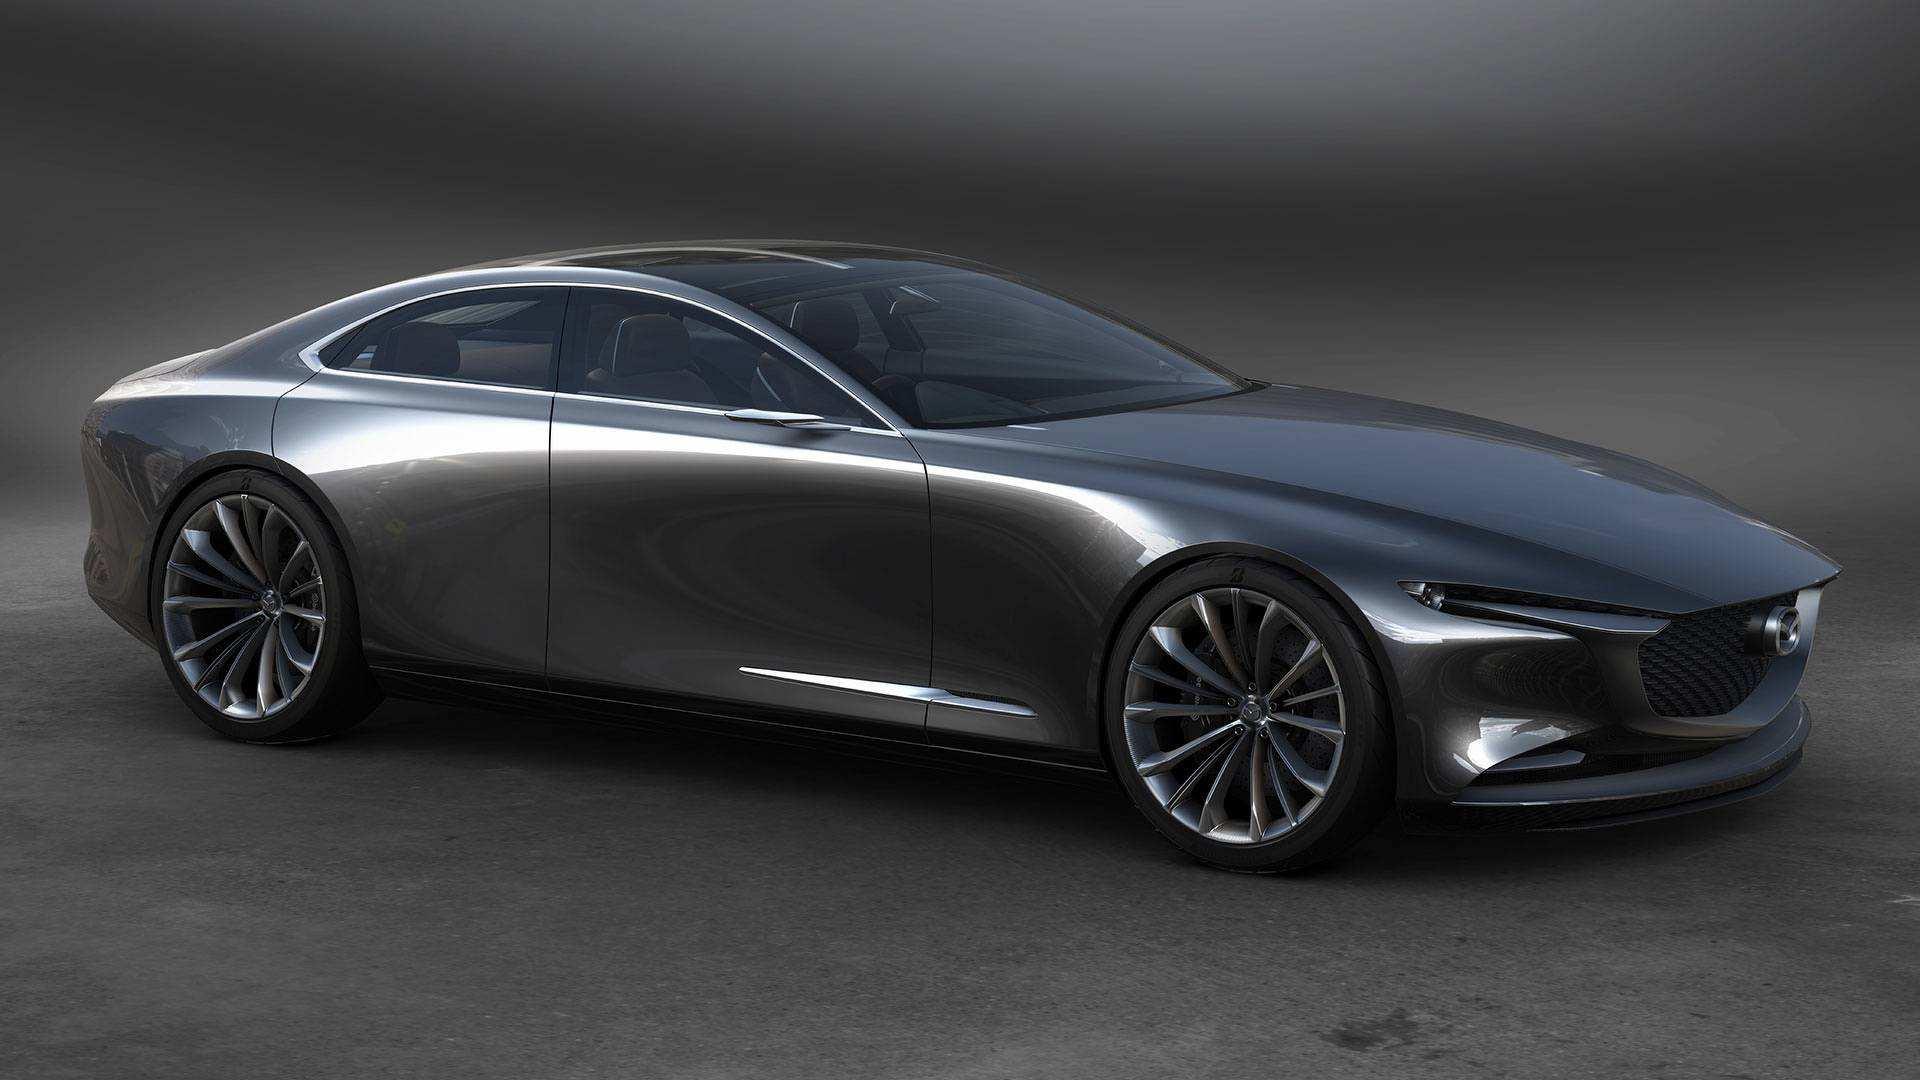 70 The 2020 Mazda Vision Exterior by 2020 Mazda Vision